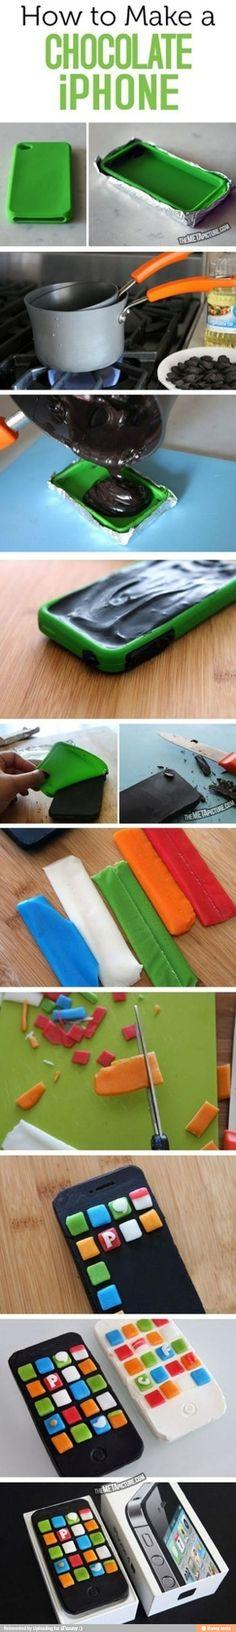 DIY Chocolate iPhone